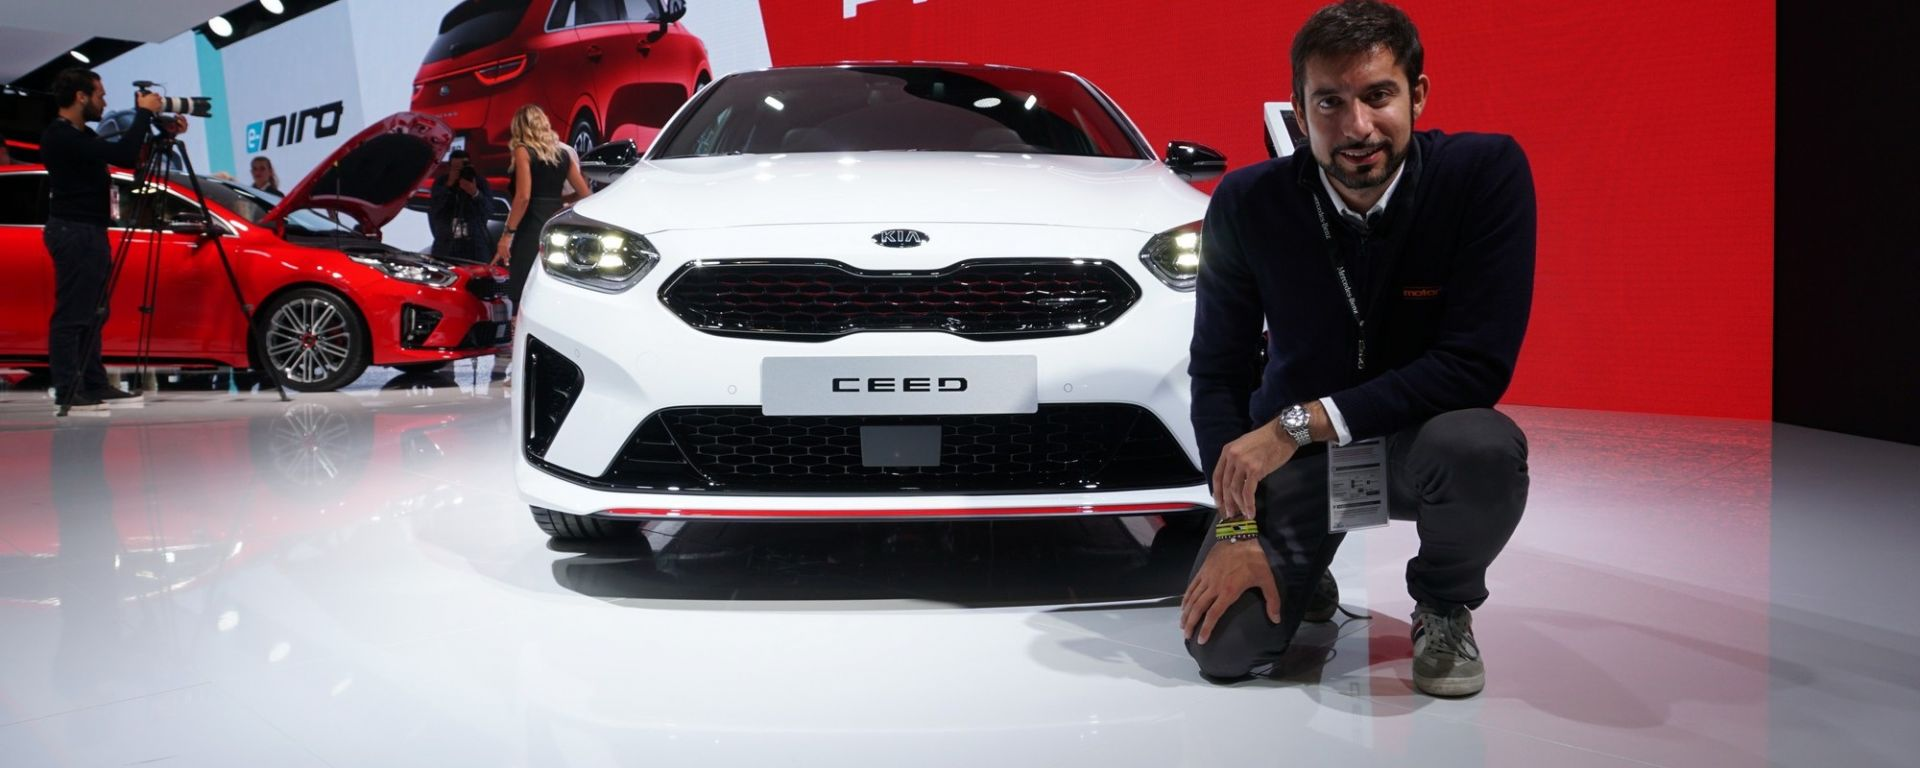 Kia Ceed GT, anteprima al Paris Motor Show 2018